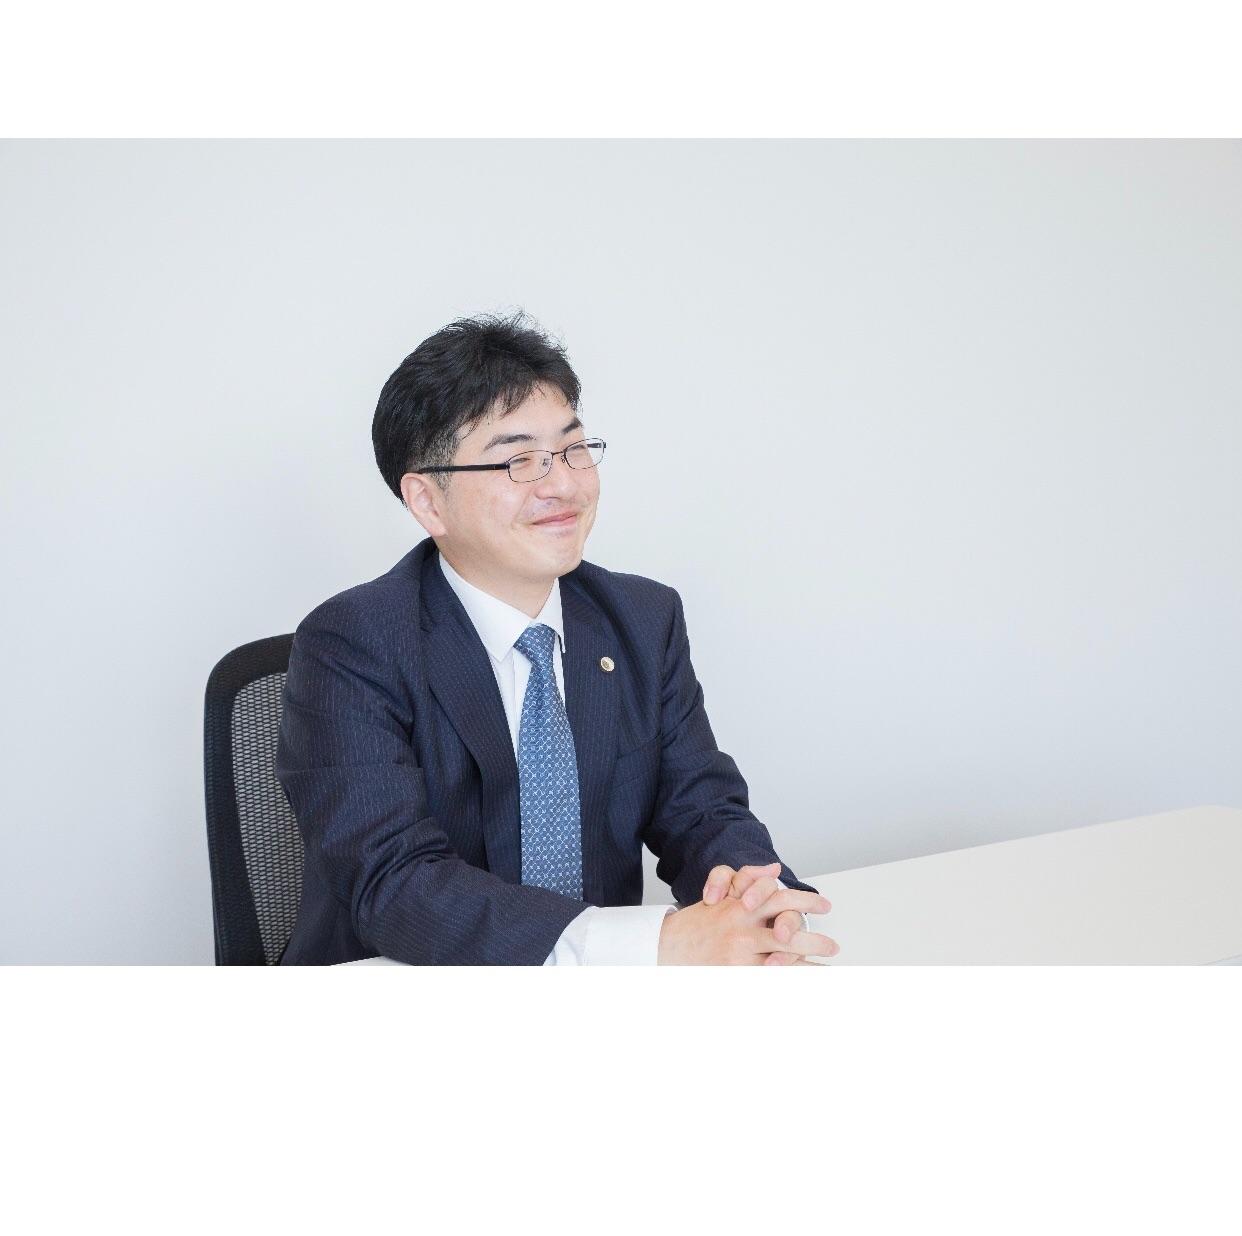 f:id:kagaribi-kotsujiko:20211013200131j:image